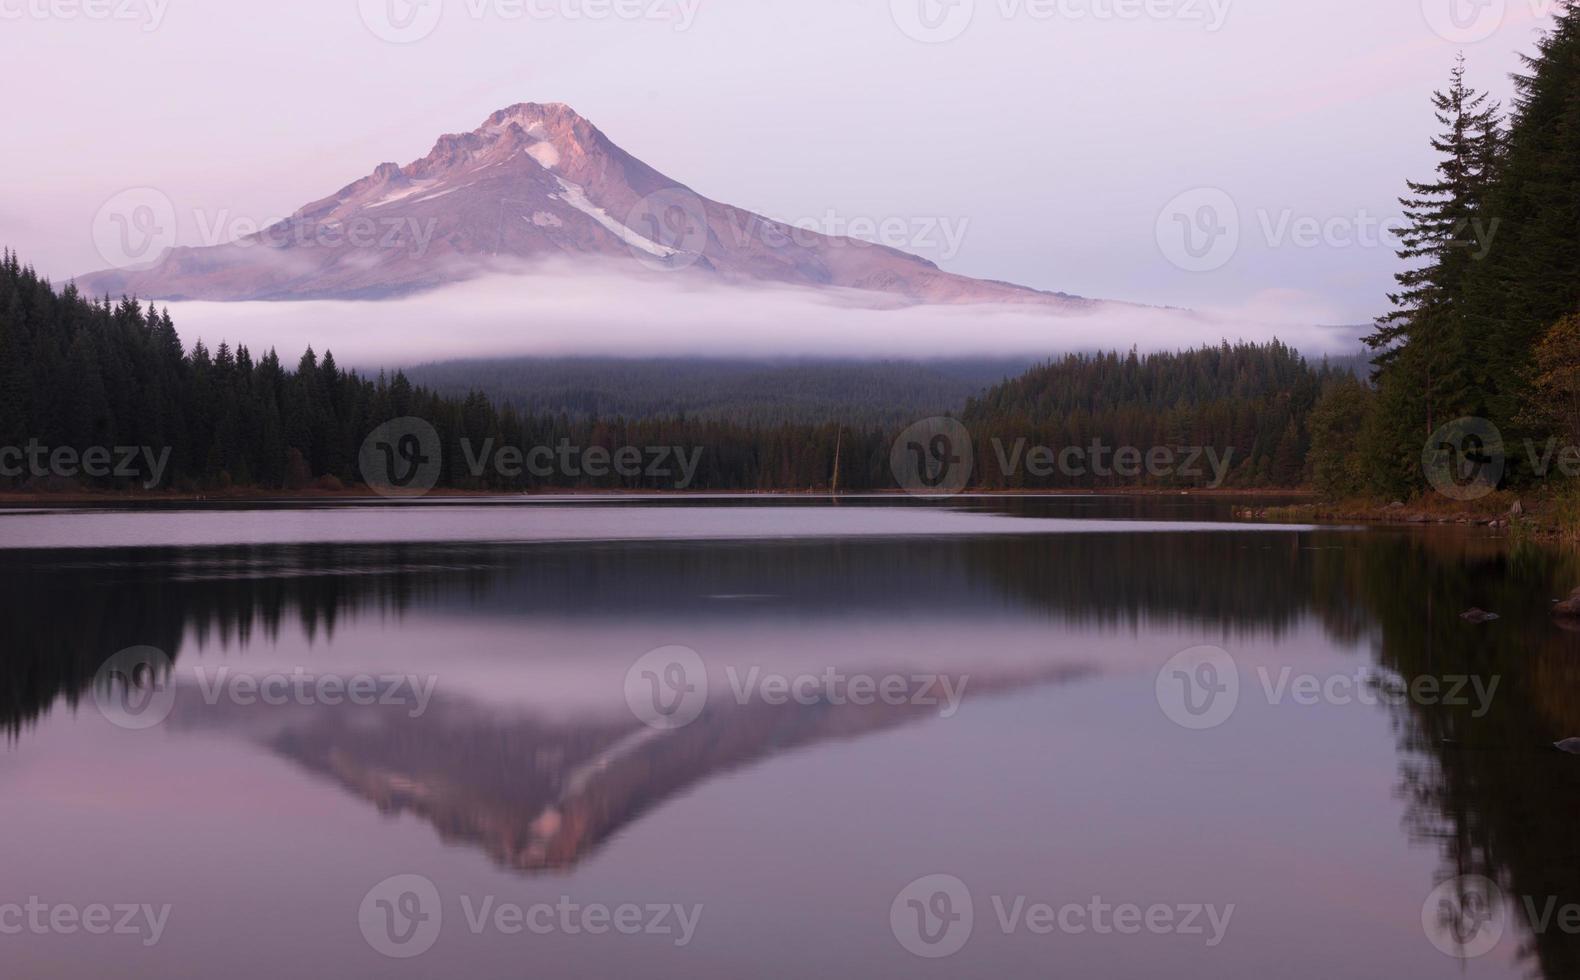 mt kap gladde reflectie trillium Lake Oregon grondgebied foto